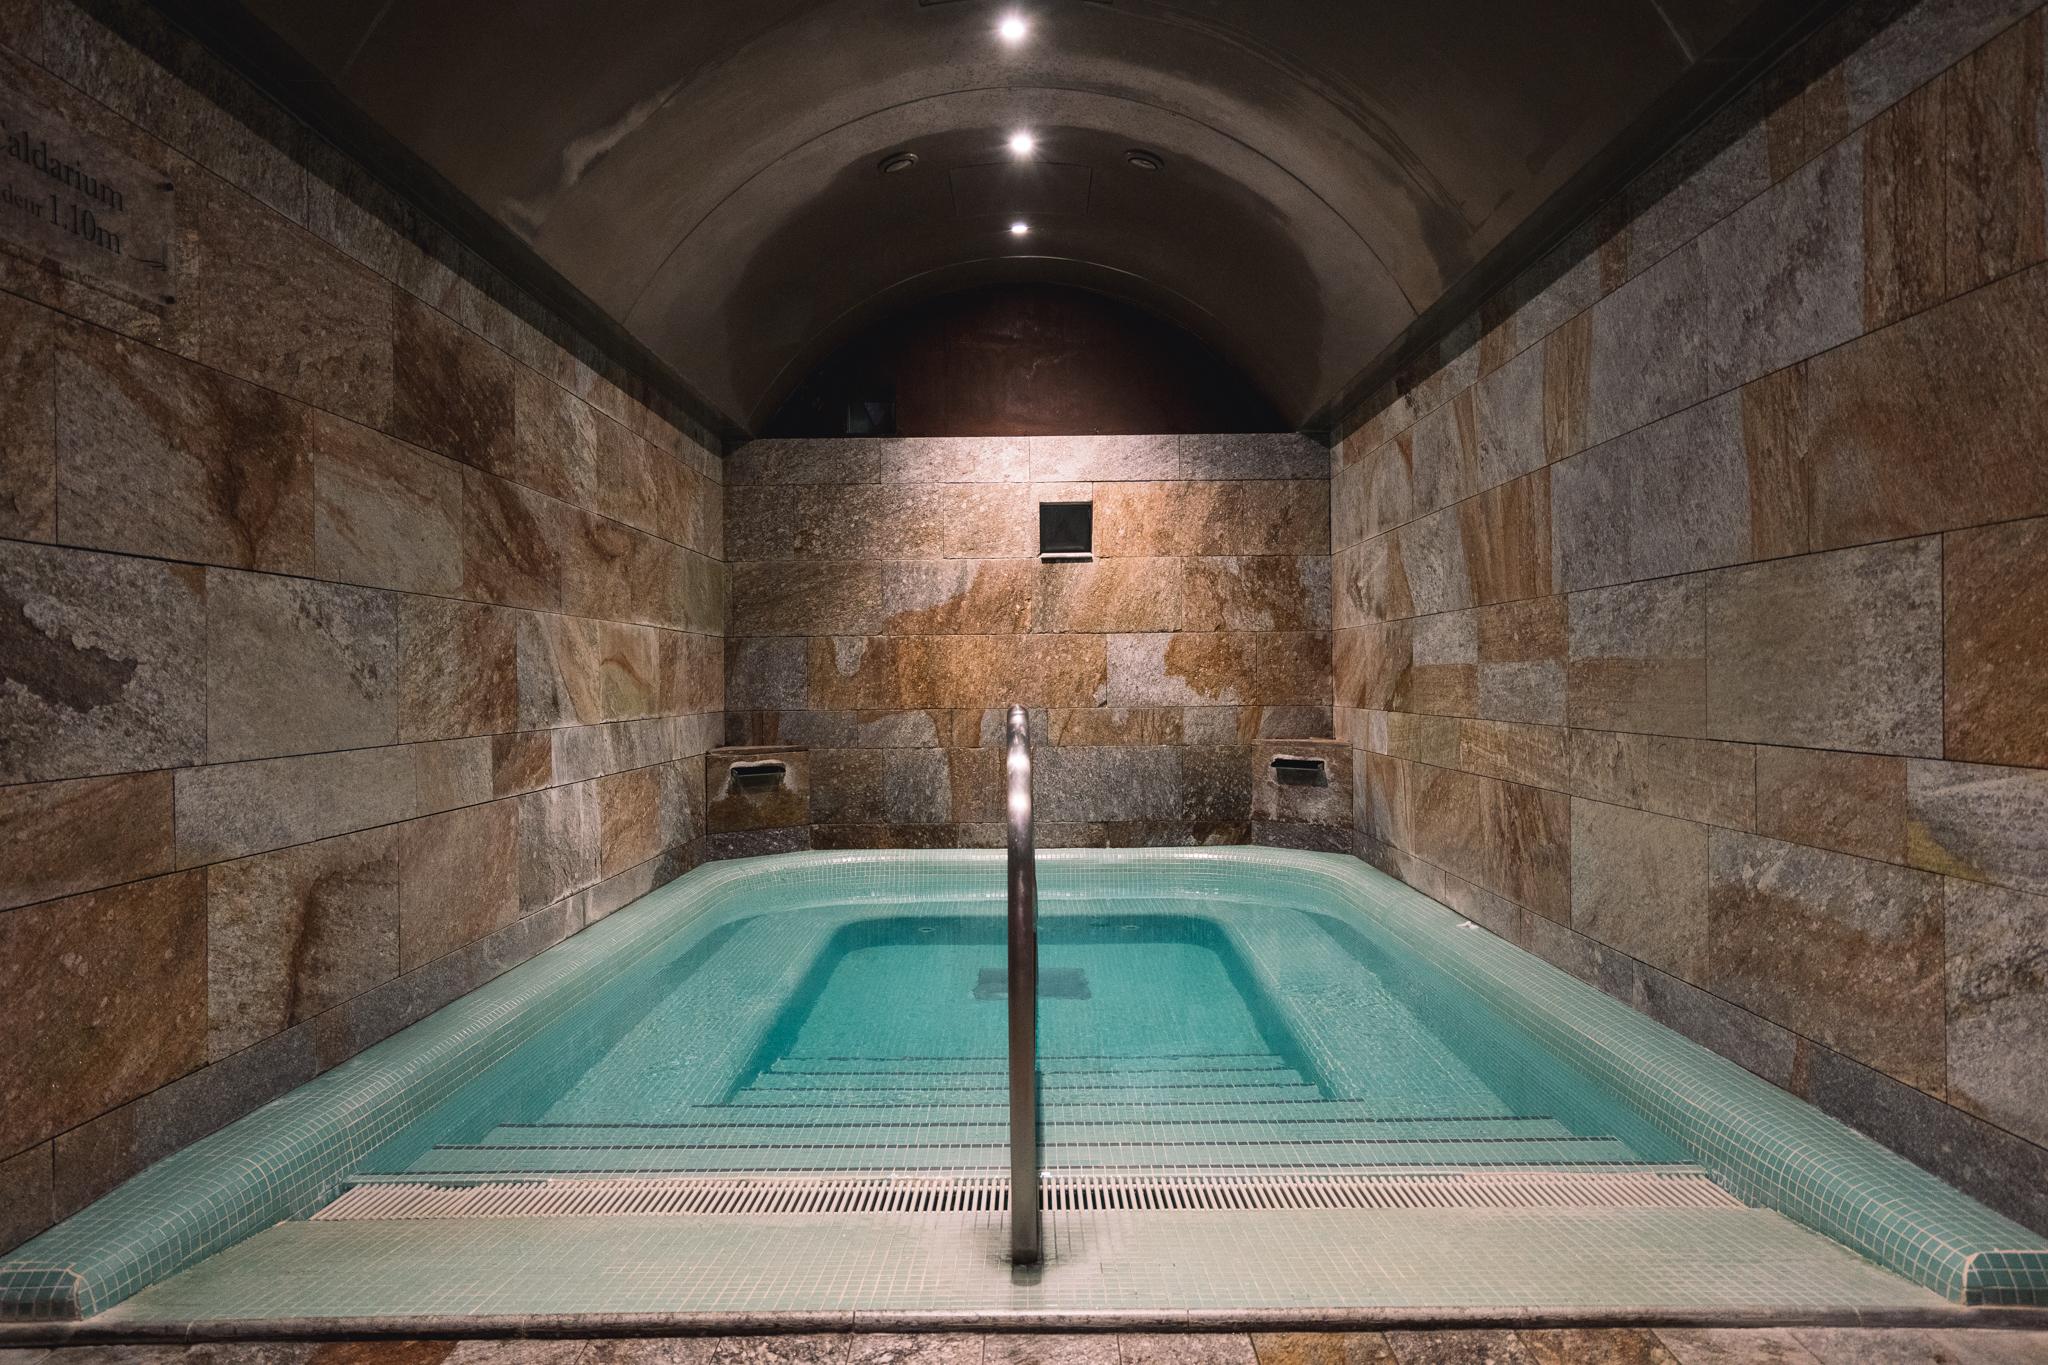 bains-couloubret-eaux-thermales-ax-les-thermes